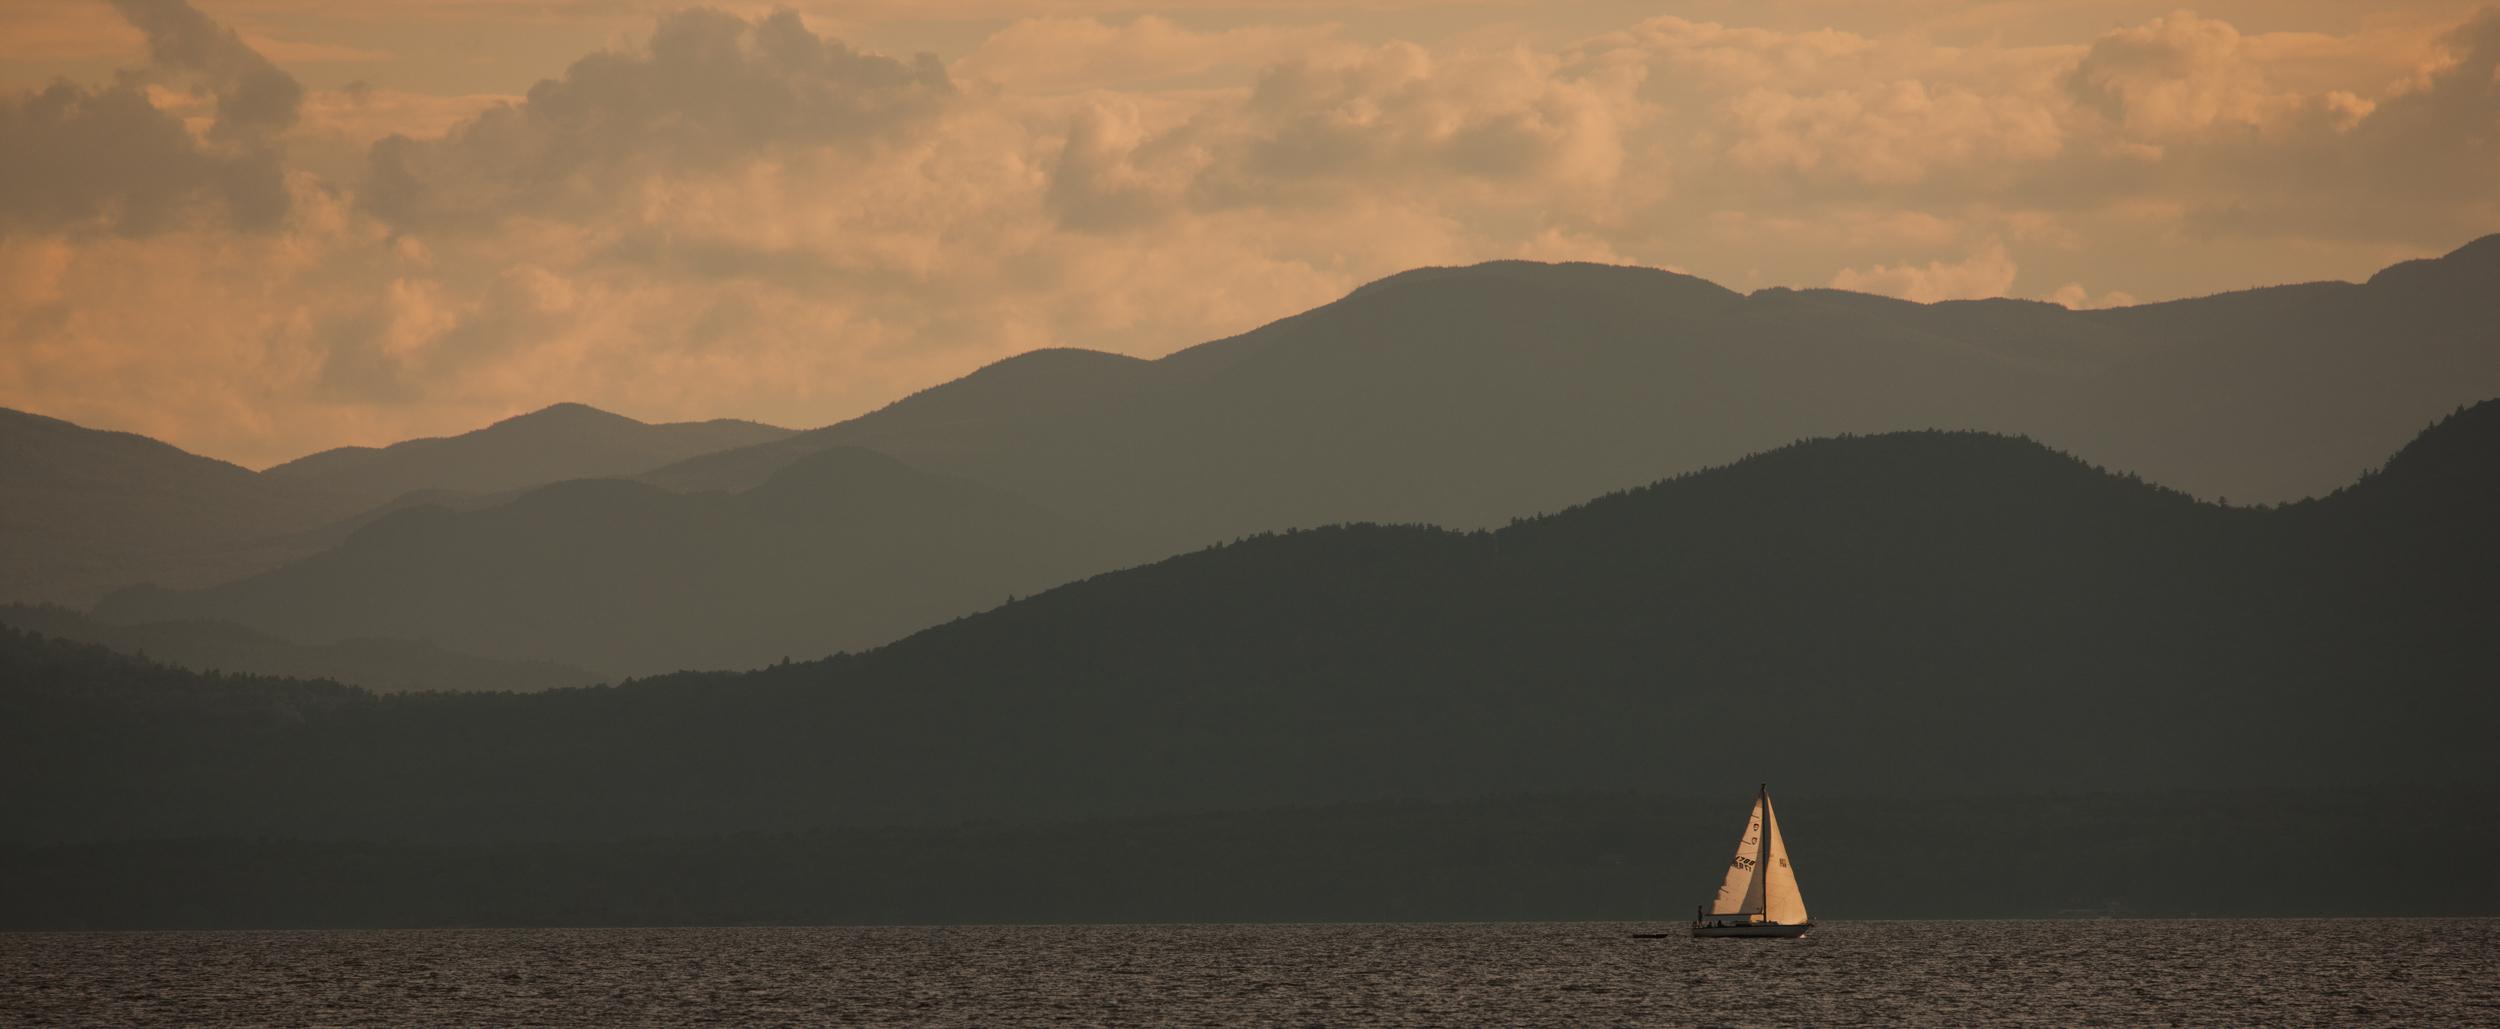 Adirondack Sunset Sail 3